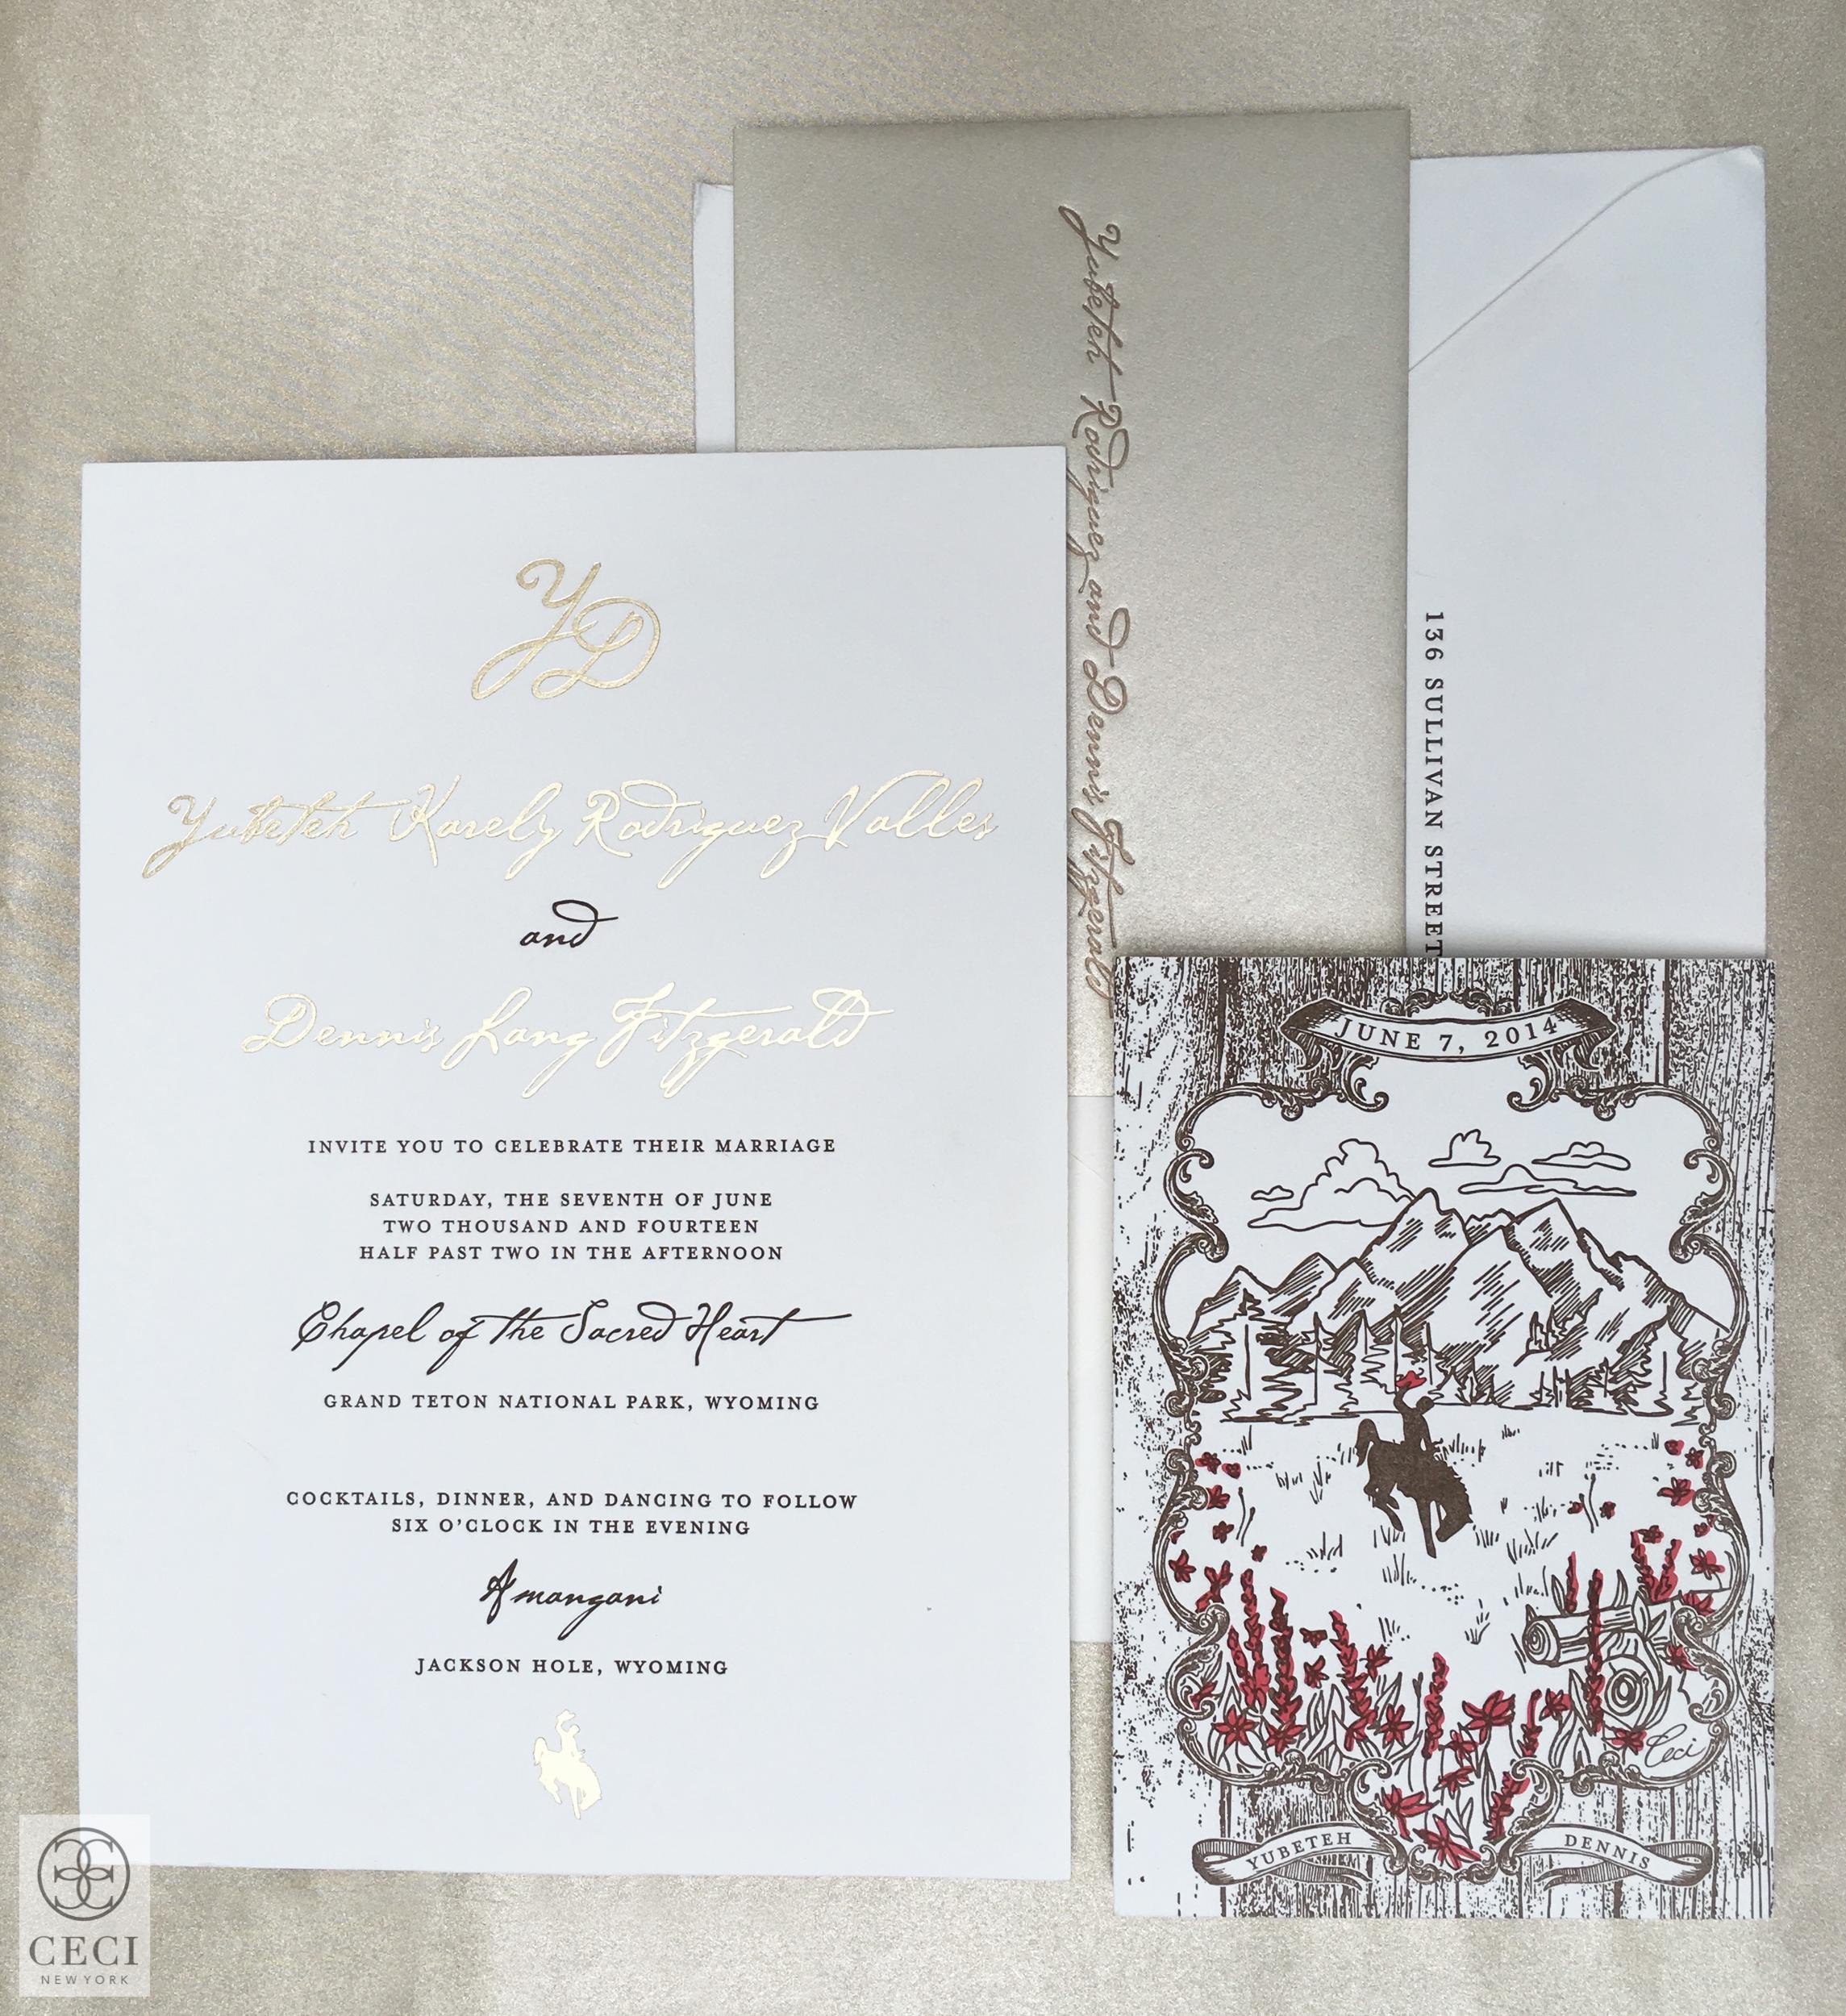 Ceci_New_York_Lyndsey_Hamilton_Events_Invitations_Wedding_Amangani_Elegance_Gold_Foil_Letterpress_Classic_Stamping_Custom_Couture_Personalized-25.jpg